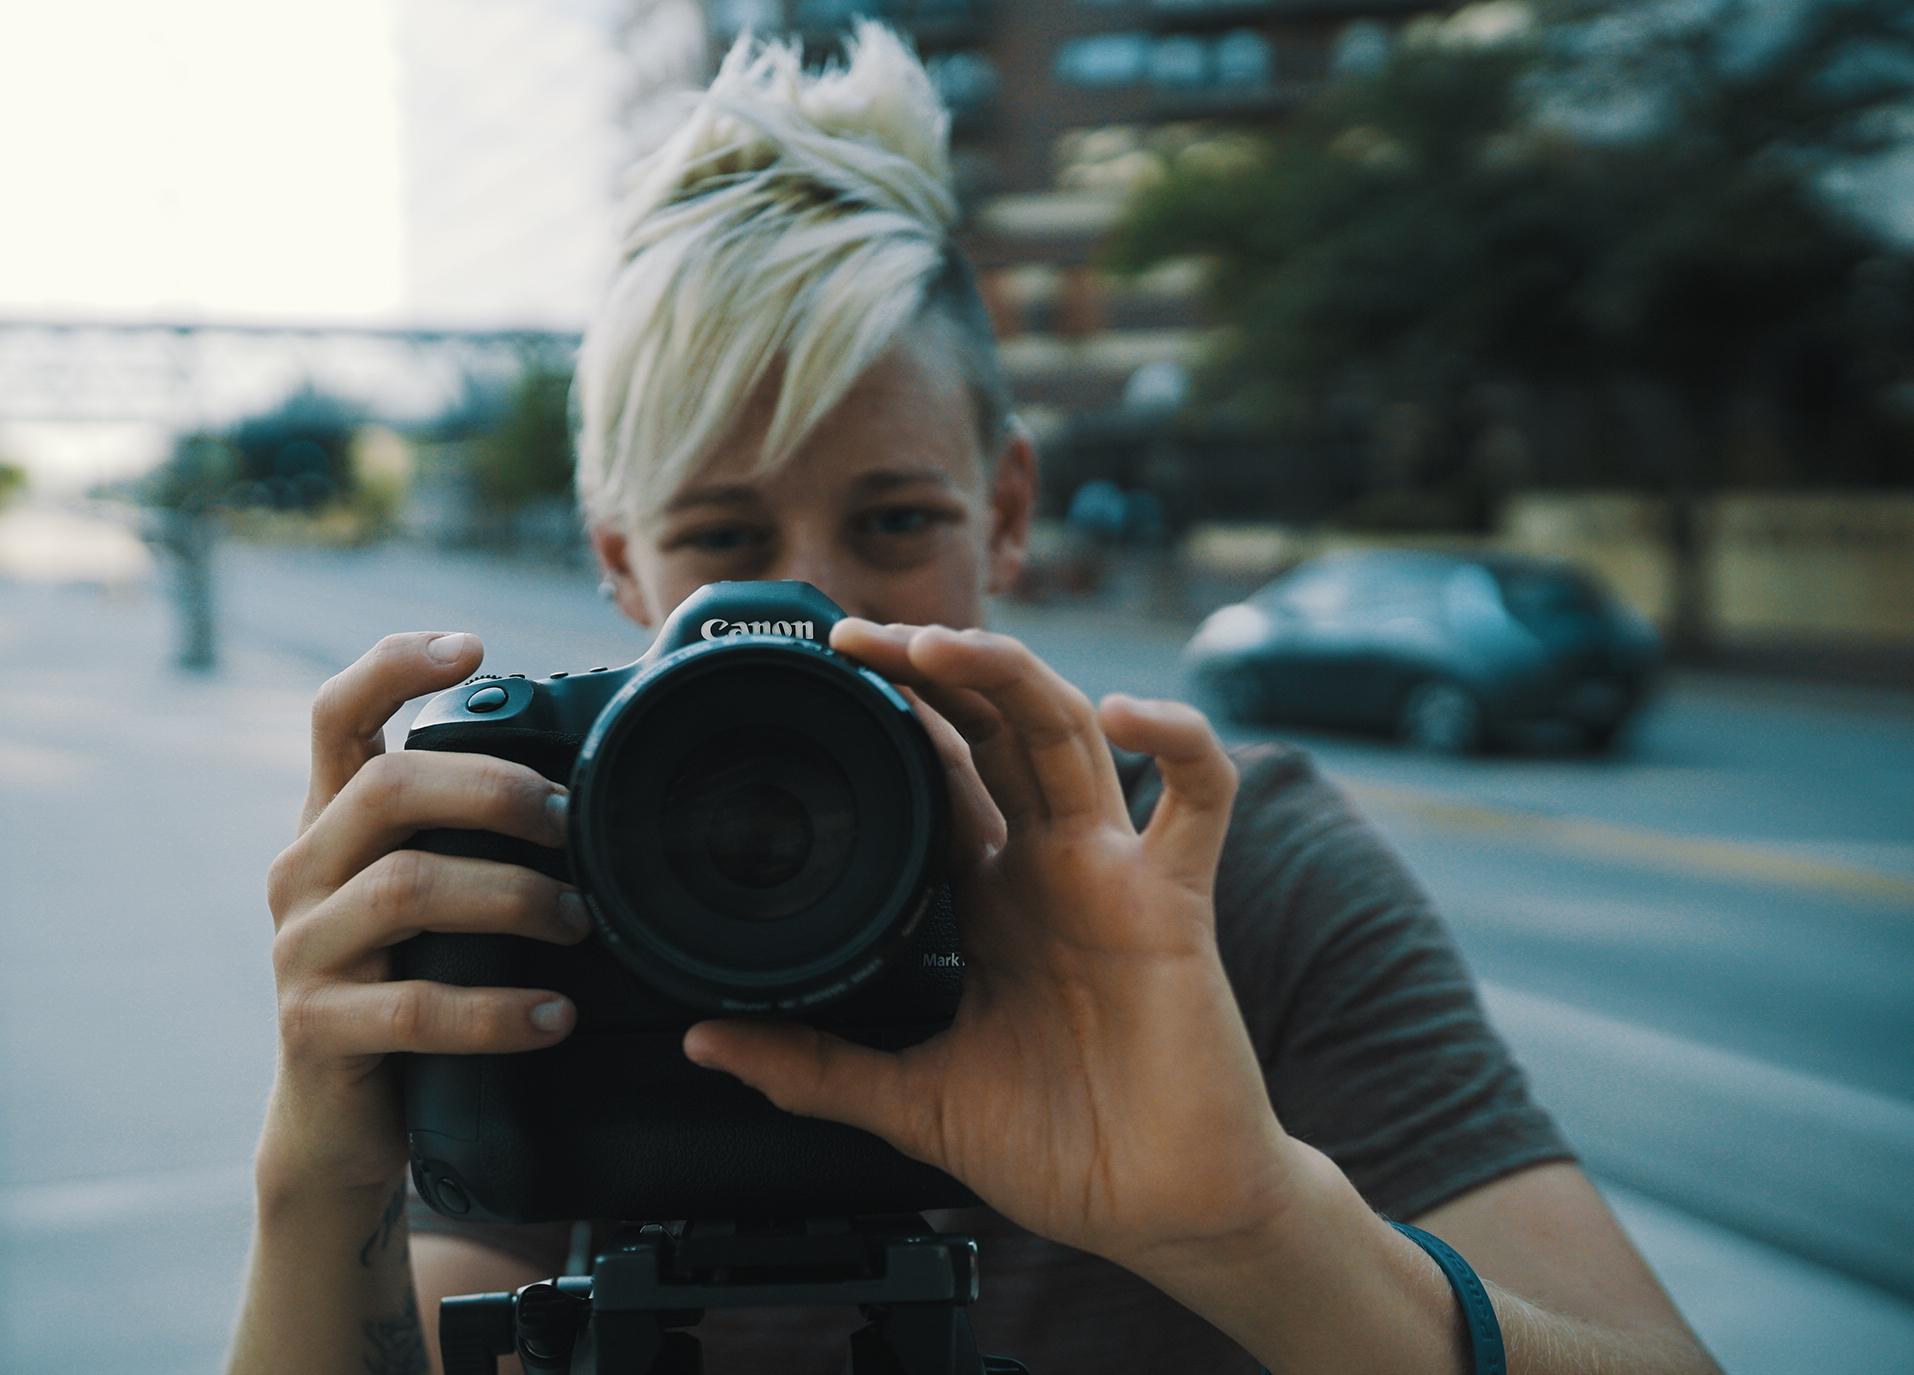 JUSTICE-SIMPSON-VIDEOGRAPHY-PORTRAIT.jpg